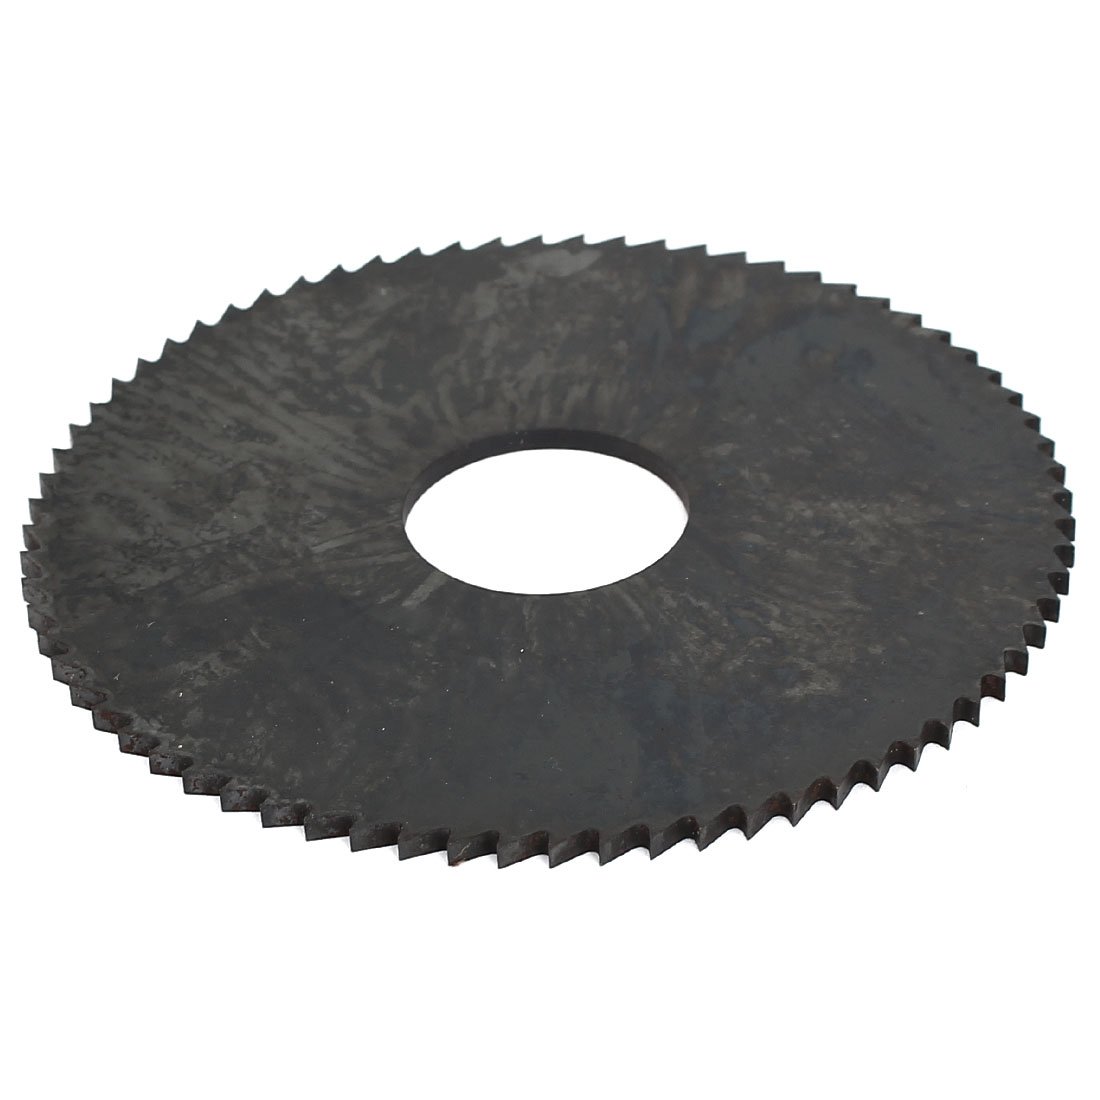 100mm x 25mm 72 Teeth HSS Round Slitting Saw Milling Machine Cutter Black